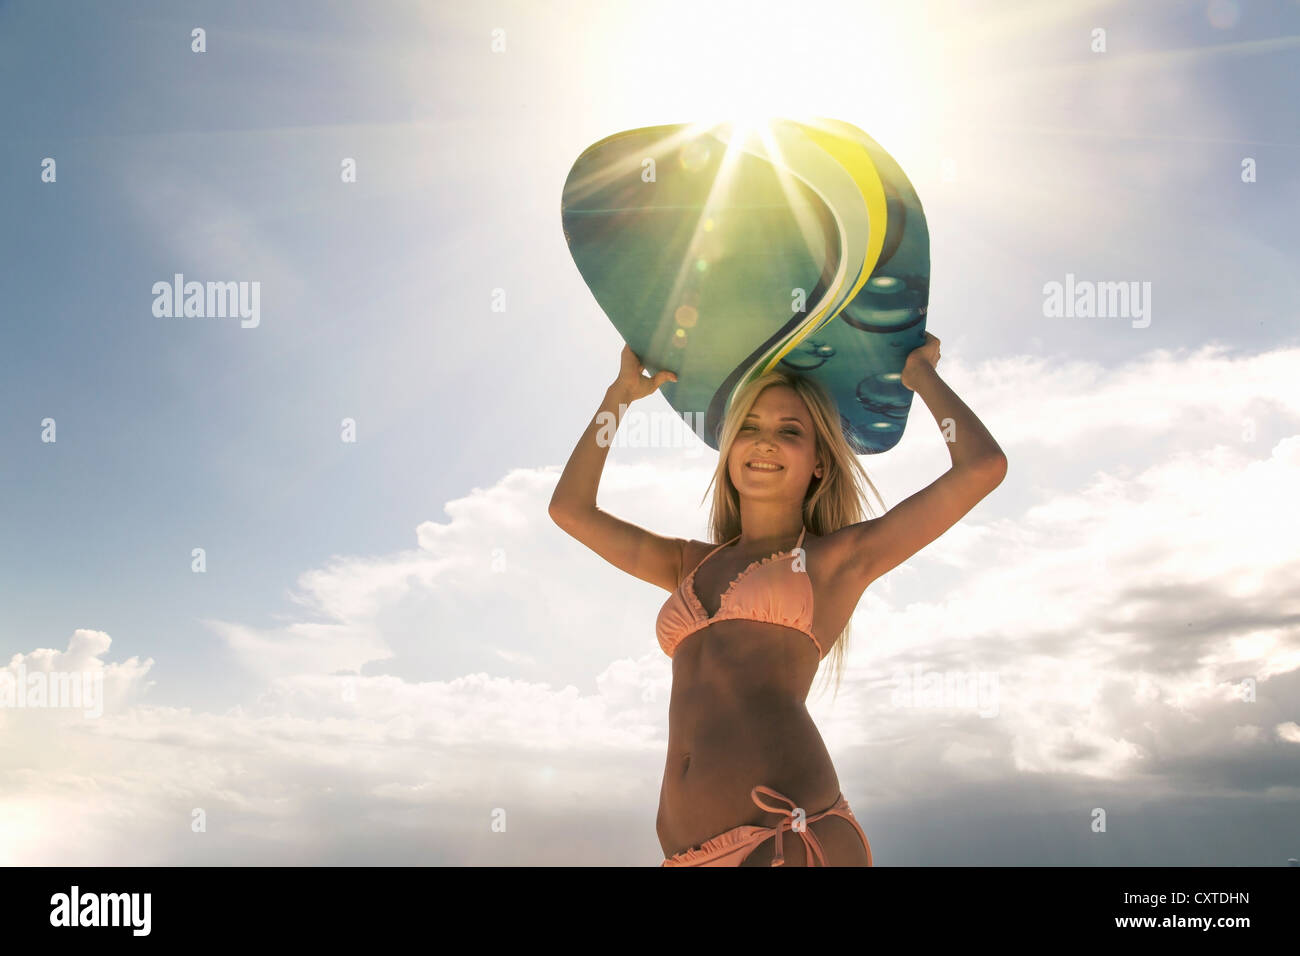 Frau mit Boogie Board im freien Stockbild